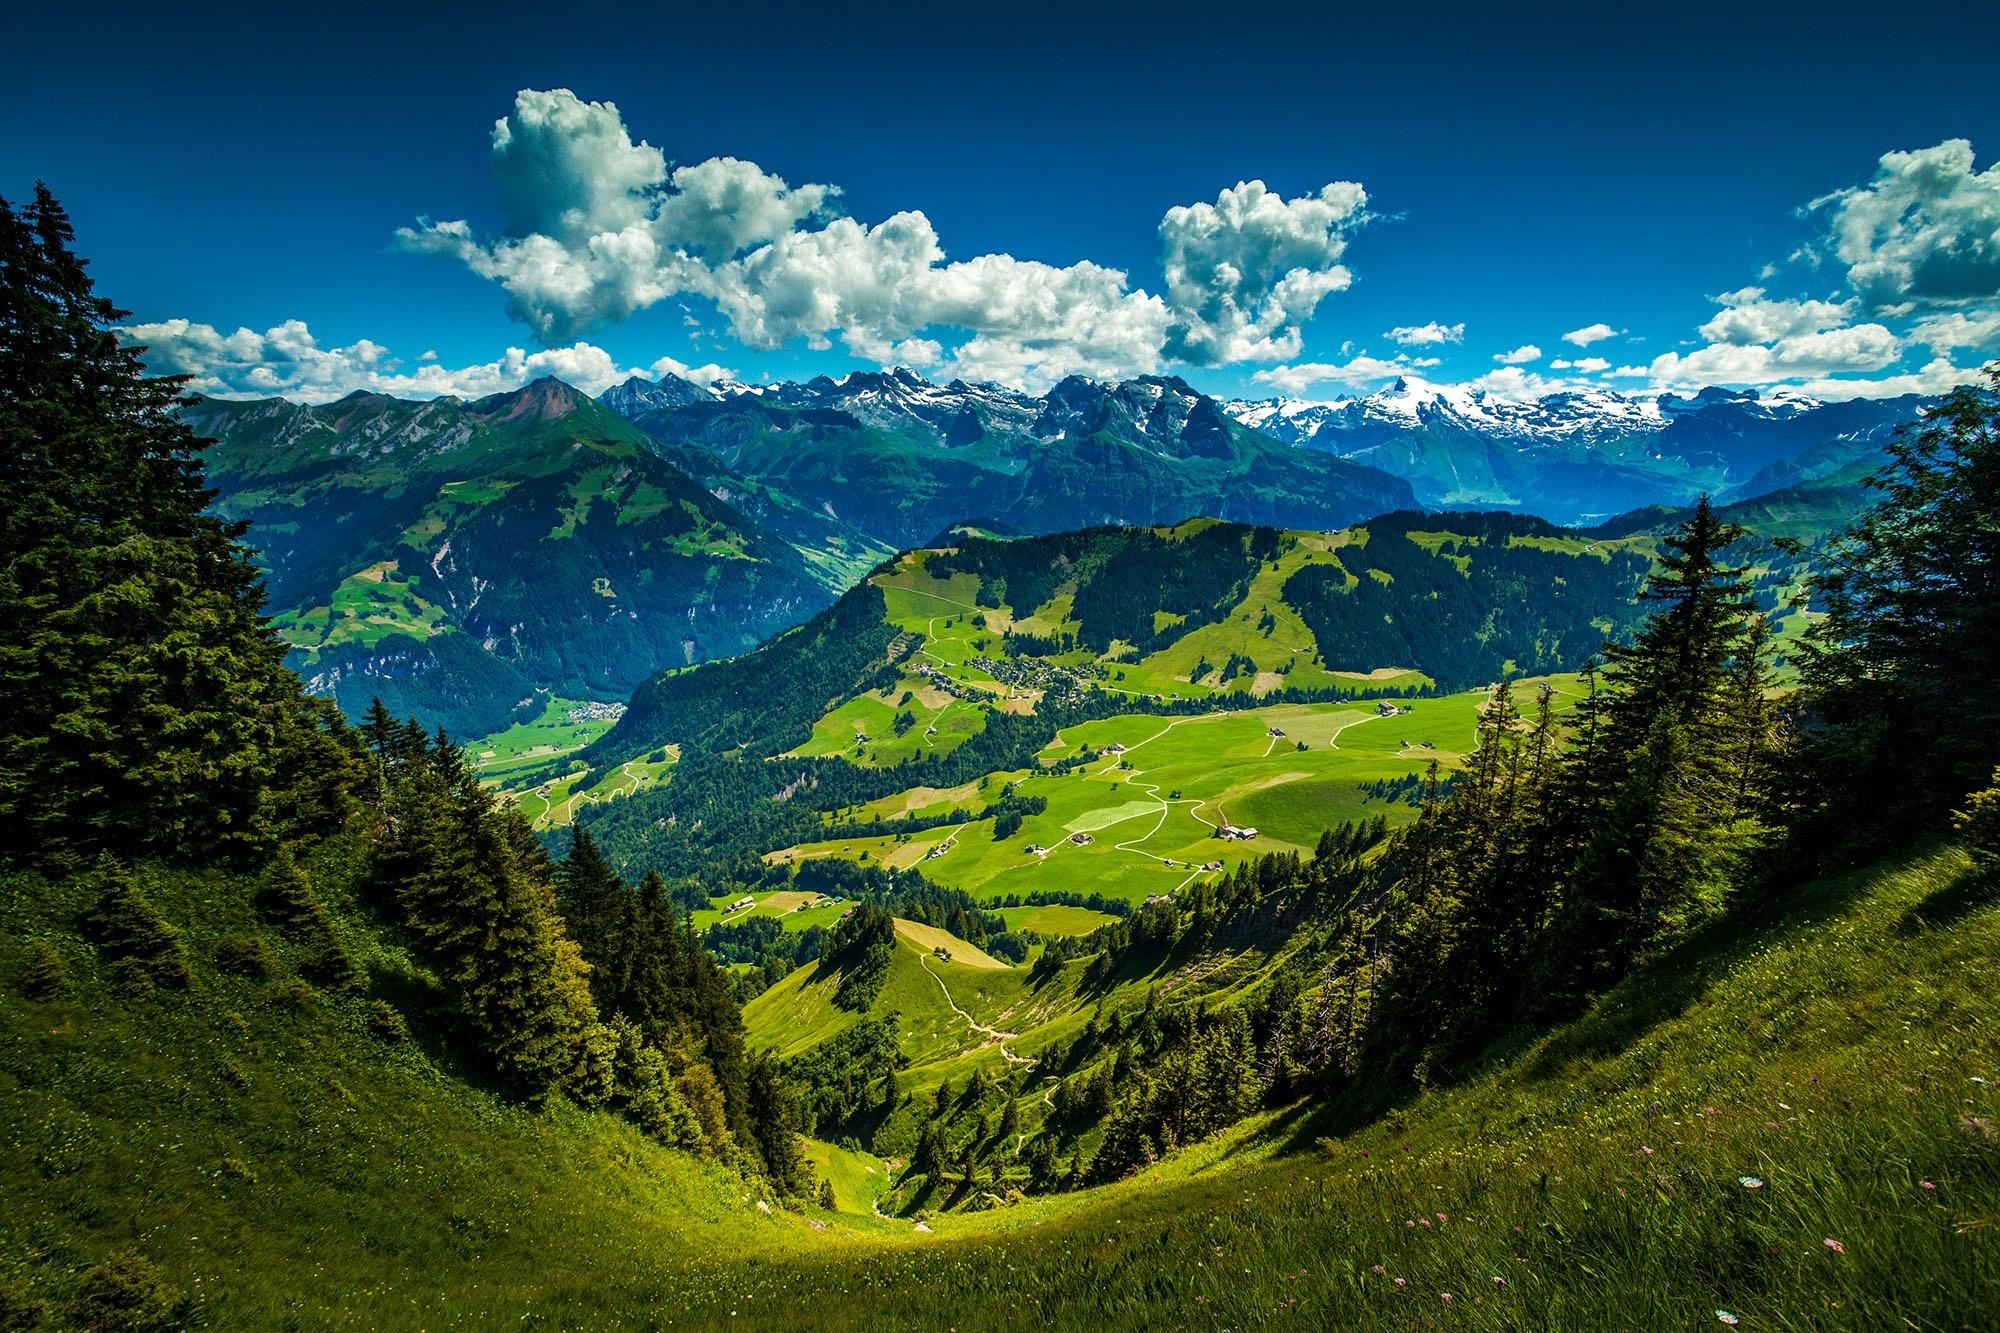 Gambar Pemandangan Hutan Gurun Awan Langit Padang Rumput